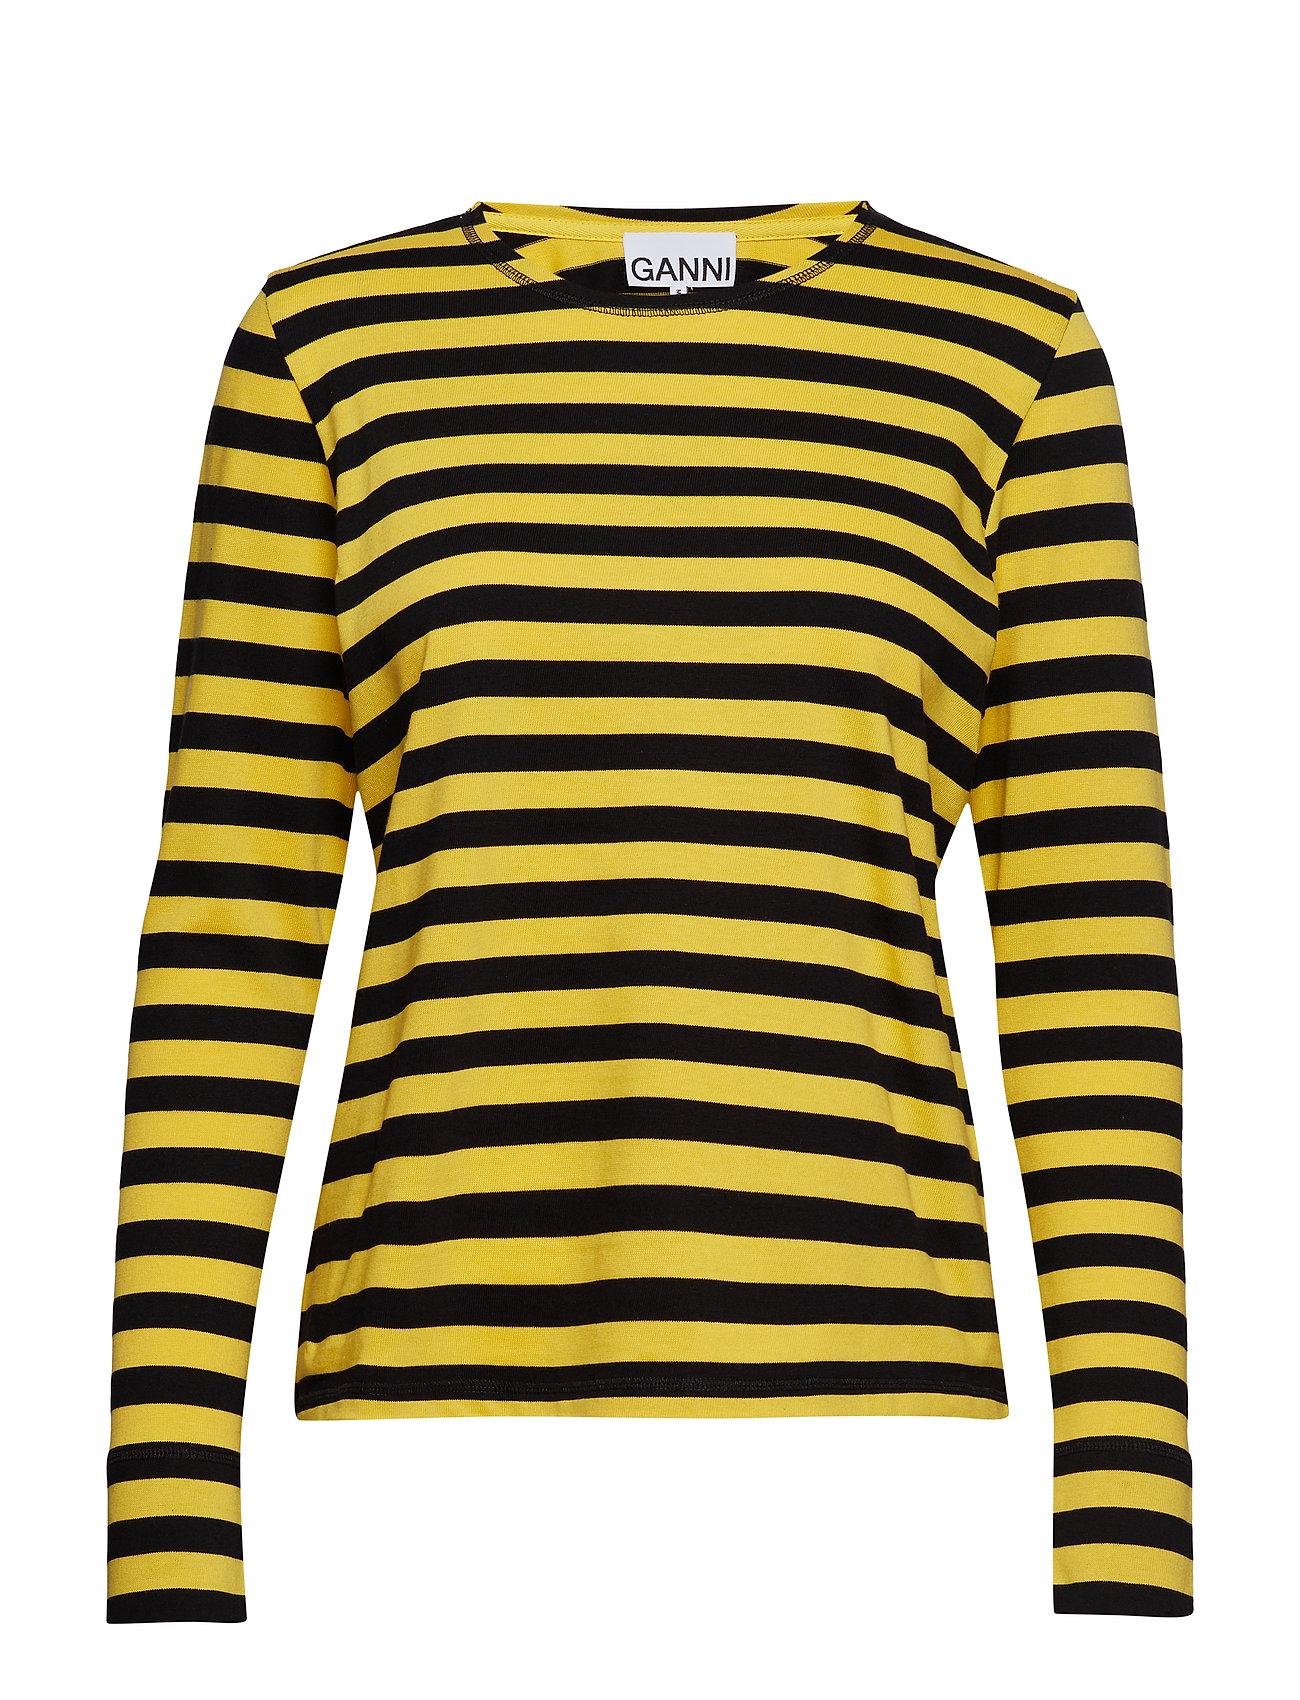 Ganni Striped Cotton Jersey - MAIZE